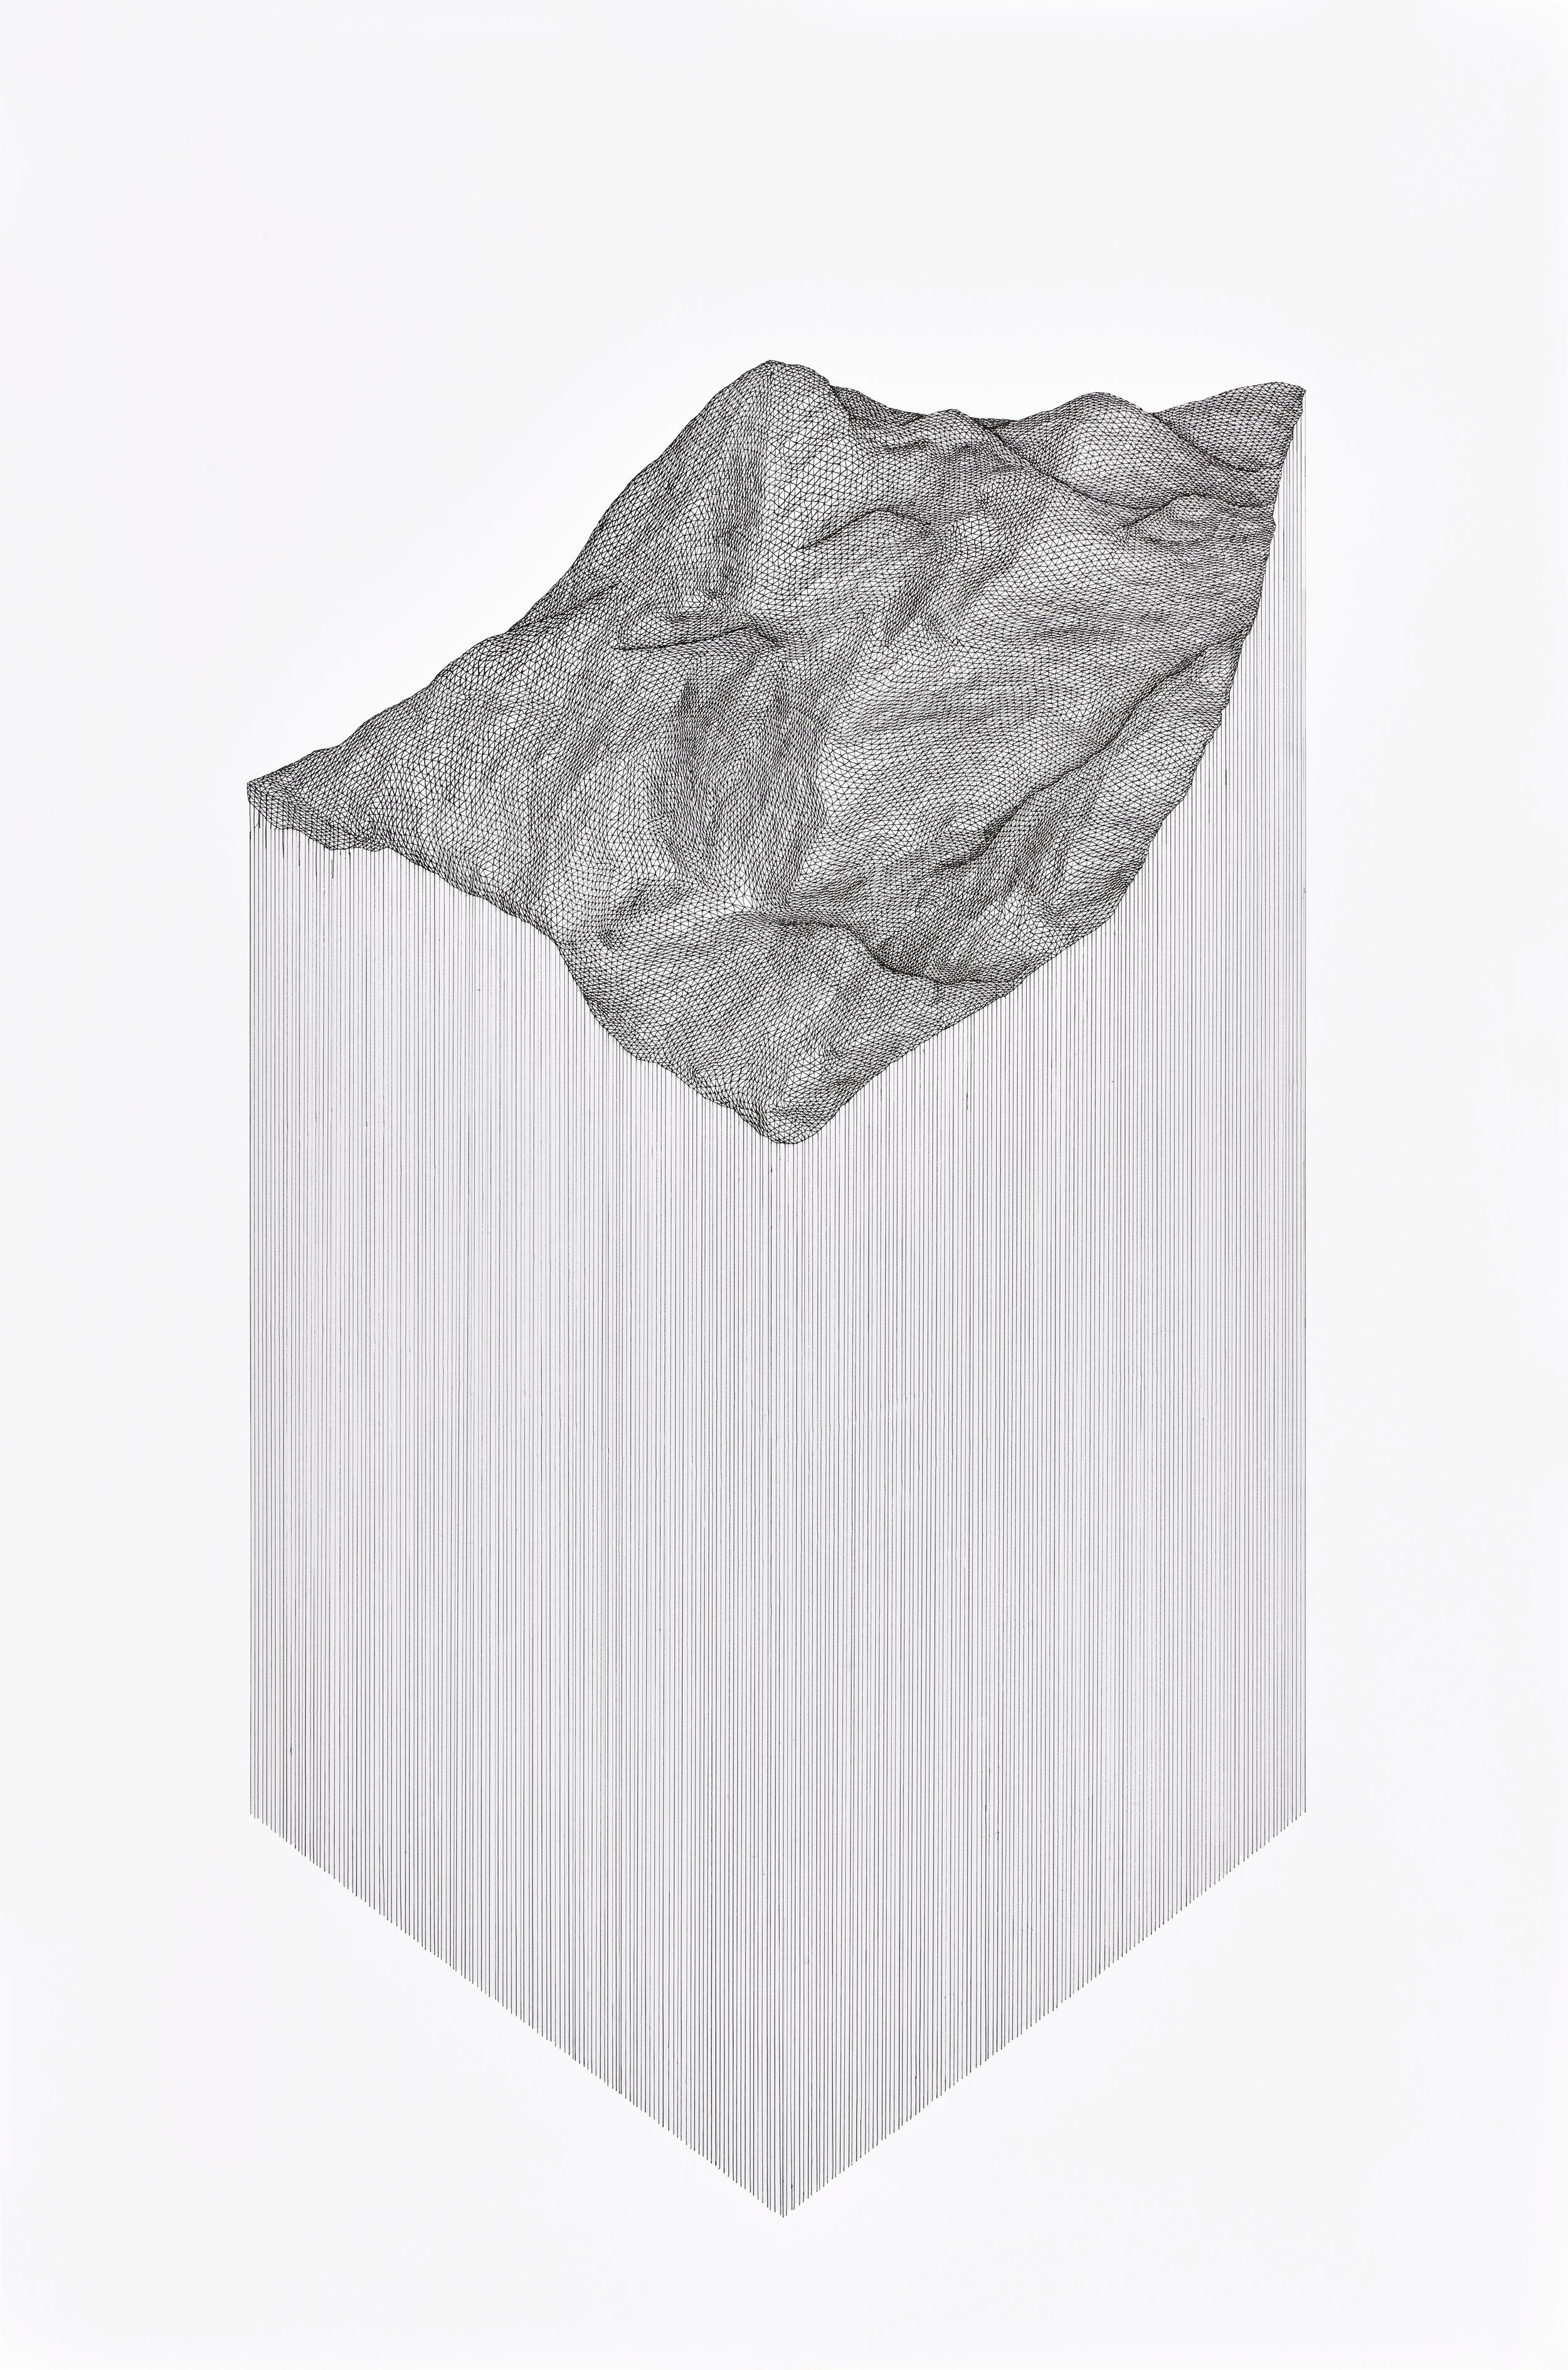 Projected Terrain , 2015  pen on 140 lb paper   SOLD